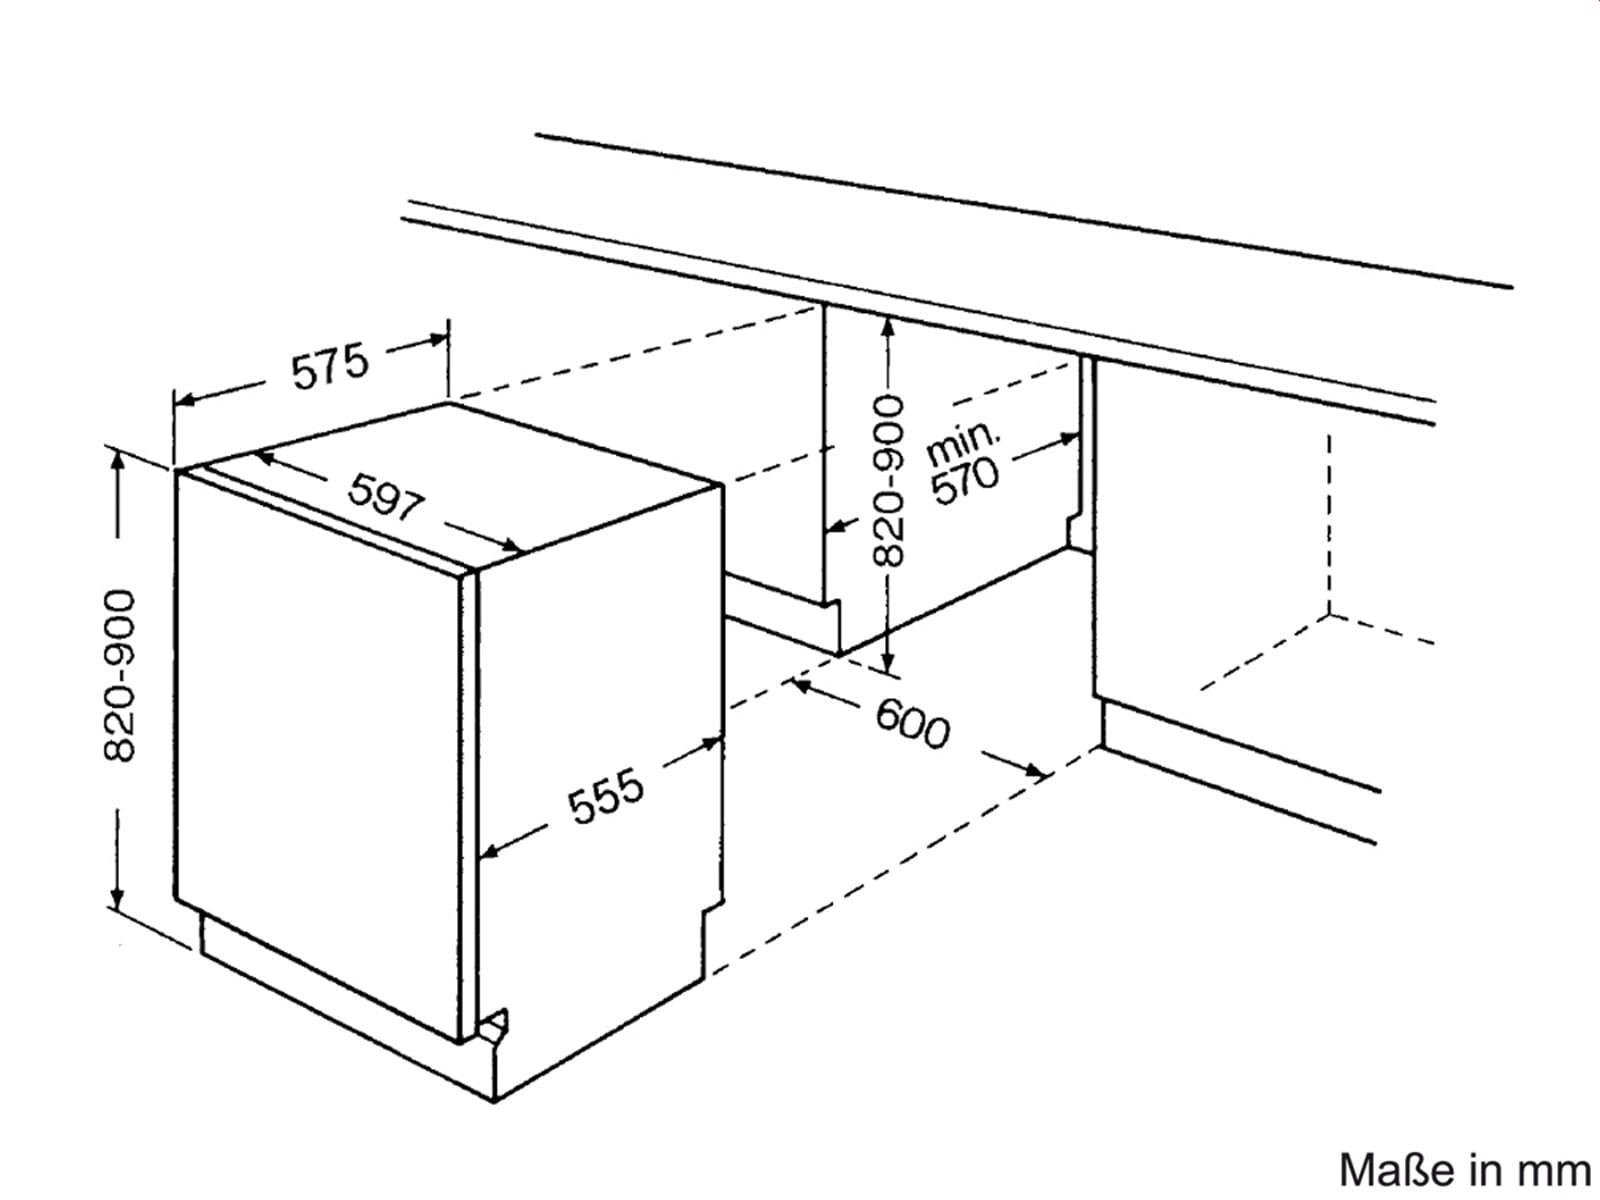 whirlpool adg 7433 fd vollintegriert einbau geschirrsp ler sp lmaschine ebay. Black Bedroom Furniture Sets. Home Design Ideas